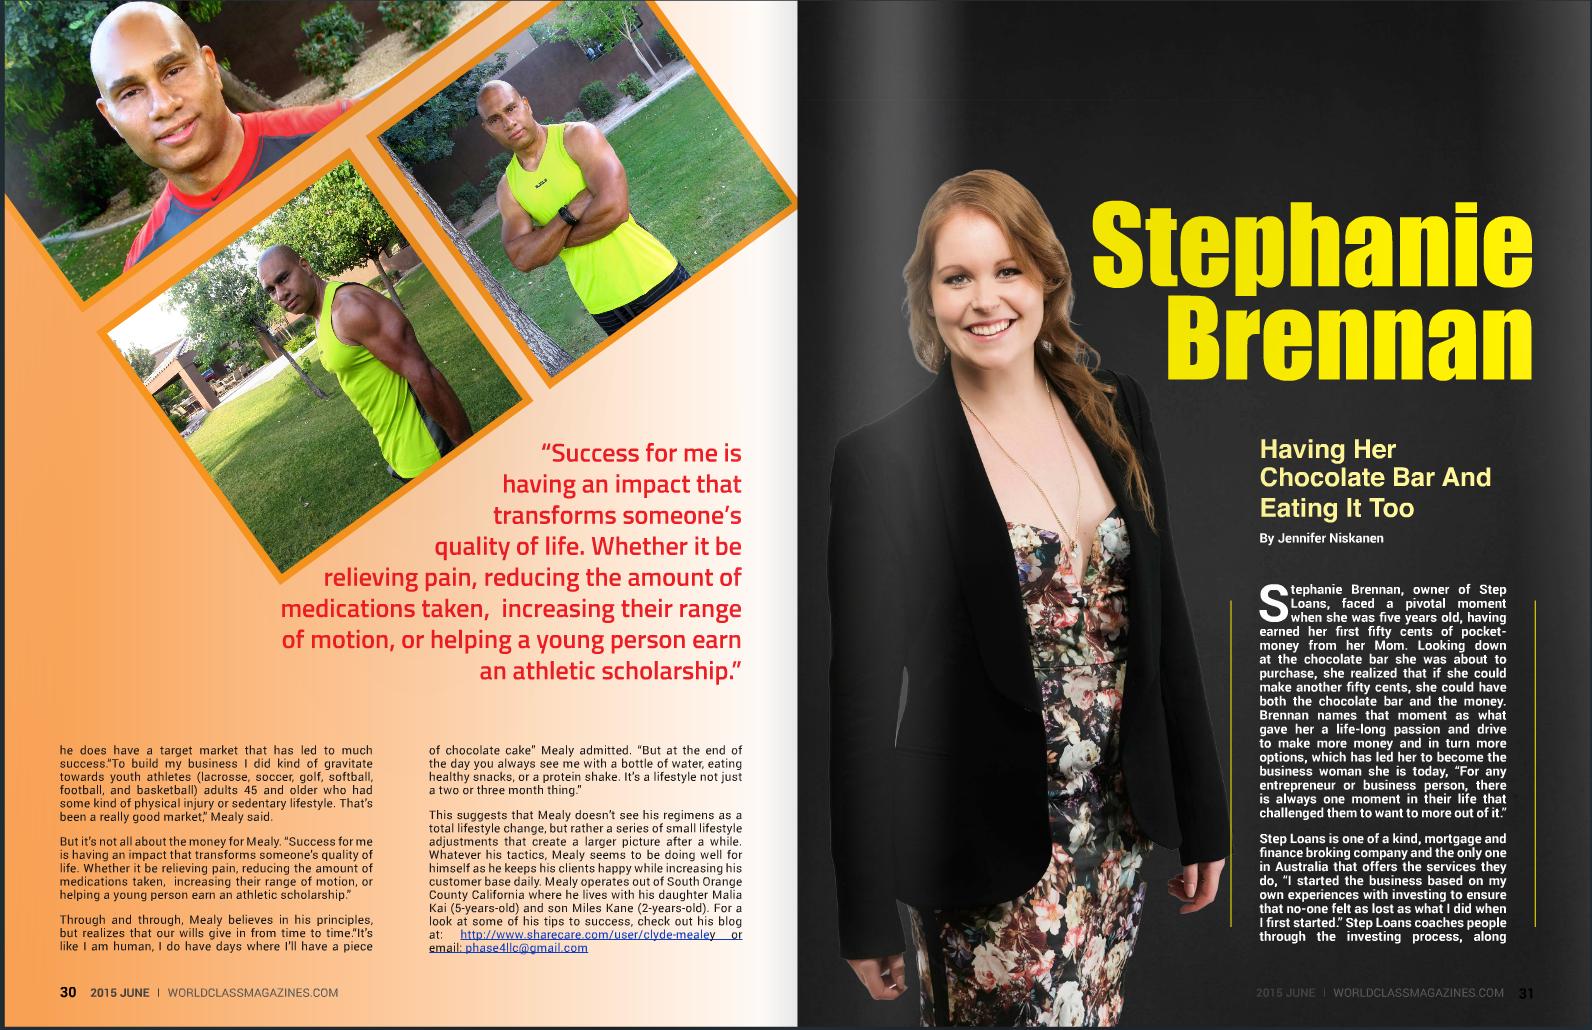 Stephanie Brennan